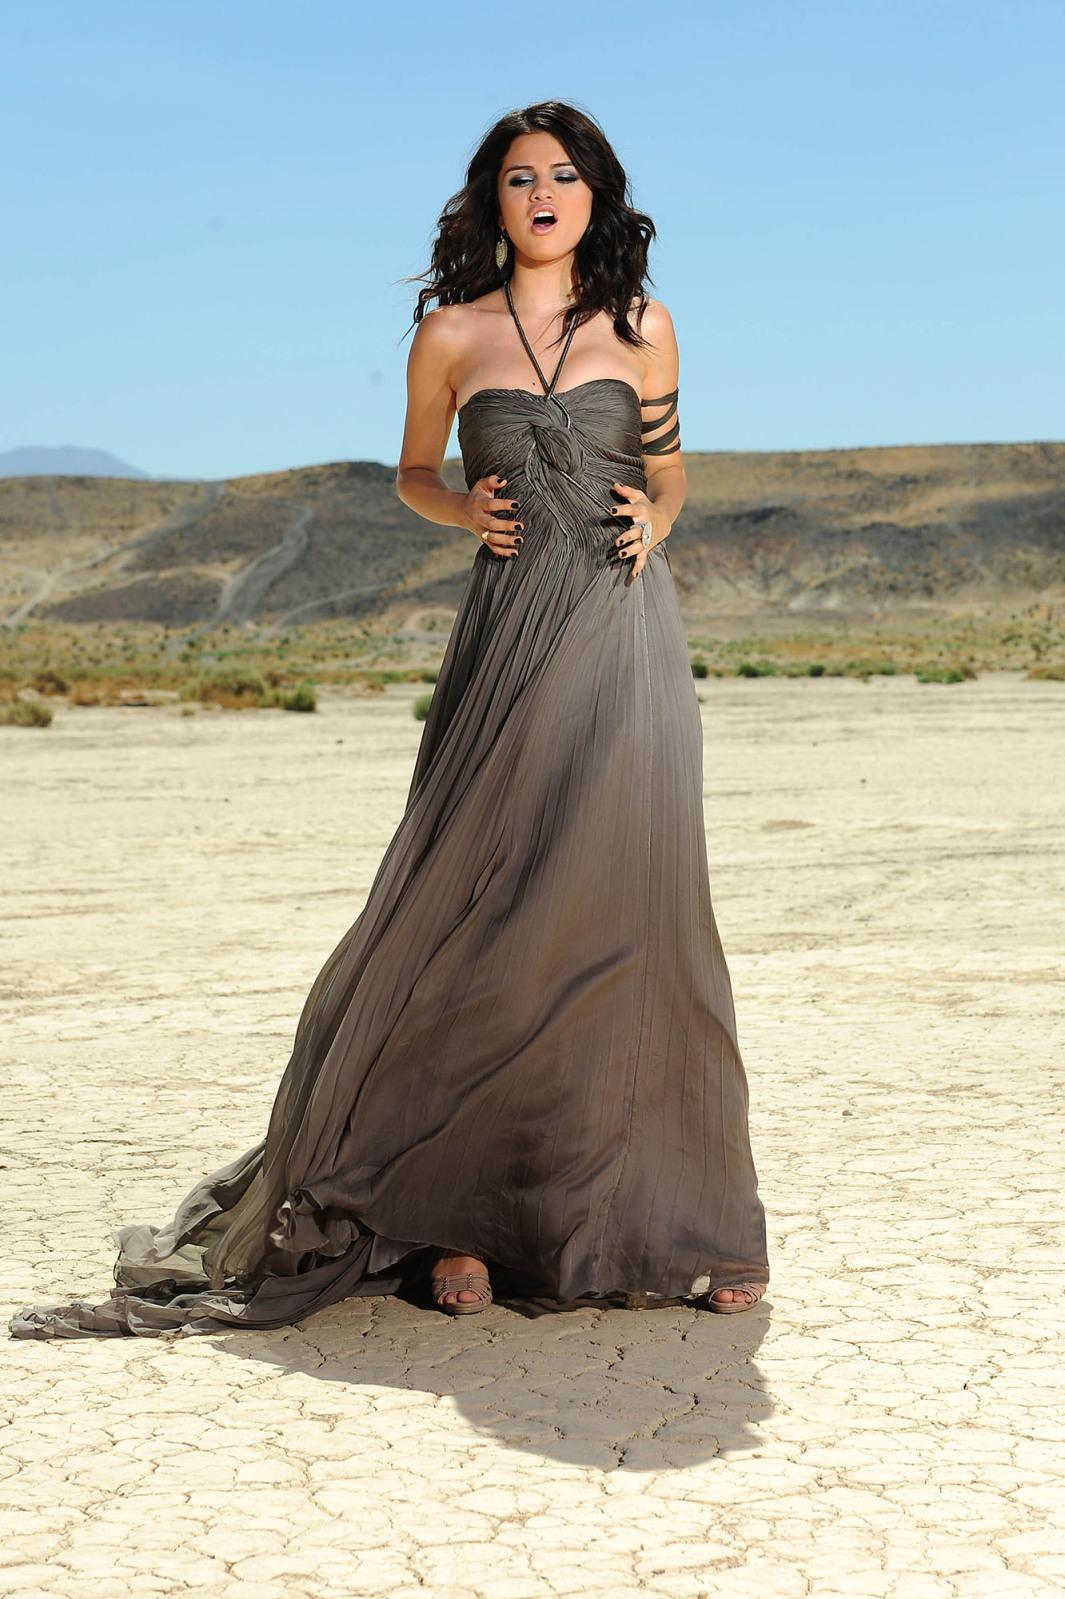 http://3.bp.blogspot.com/-rI3cb4_elSk/Tcwm64g9WVI/AAAAAAAANd4/wVK1ZIABQkE/s1600/Selena%2BGomez21.jpg